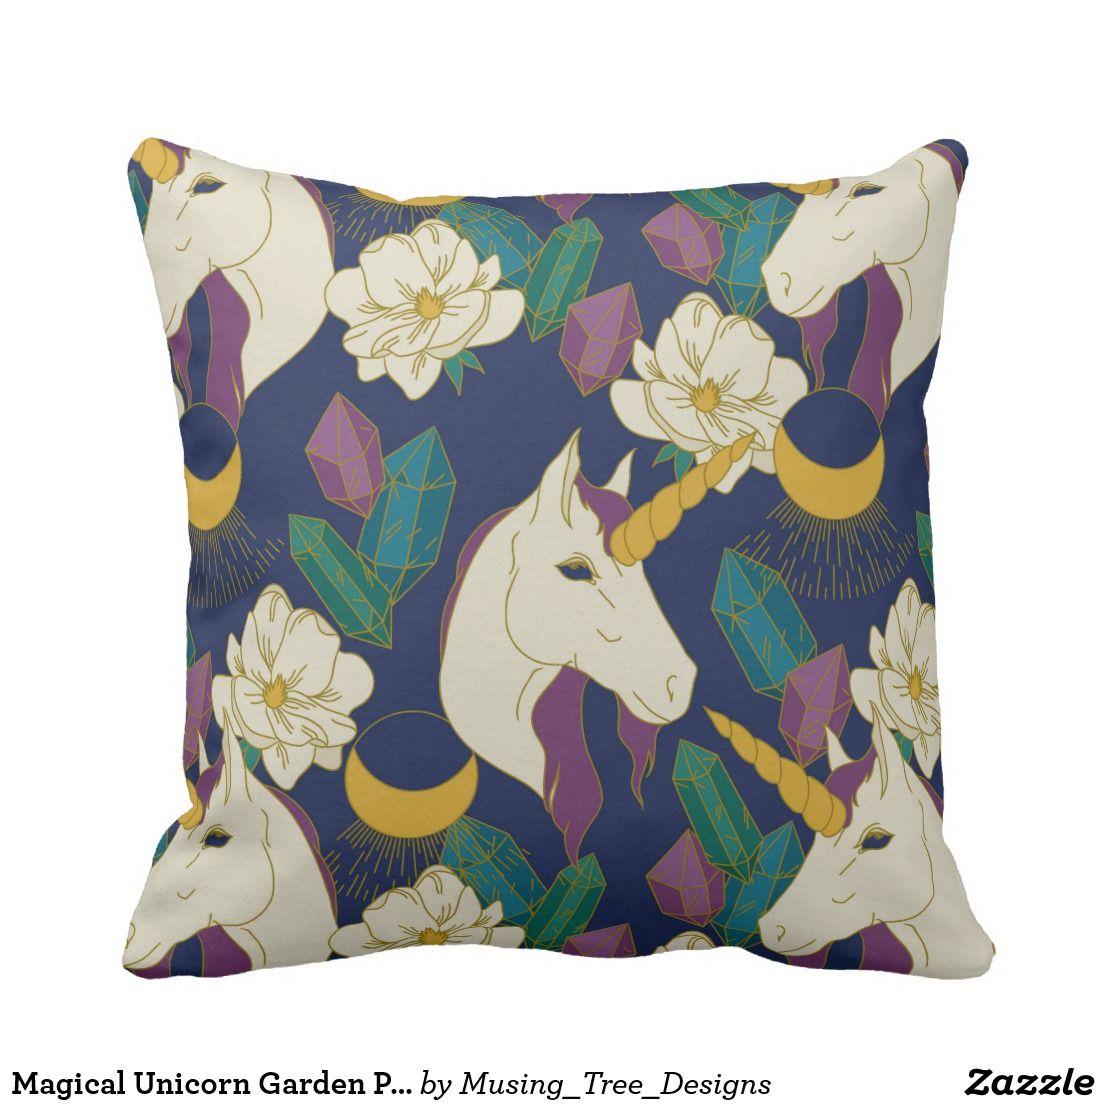 Magical unicorn garden pillow my zazzle pinterest magical